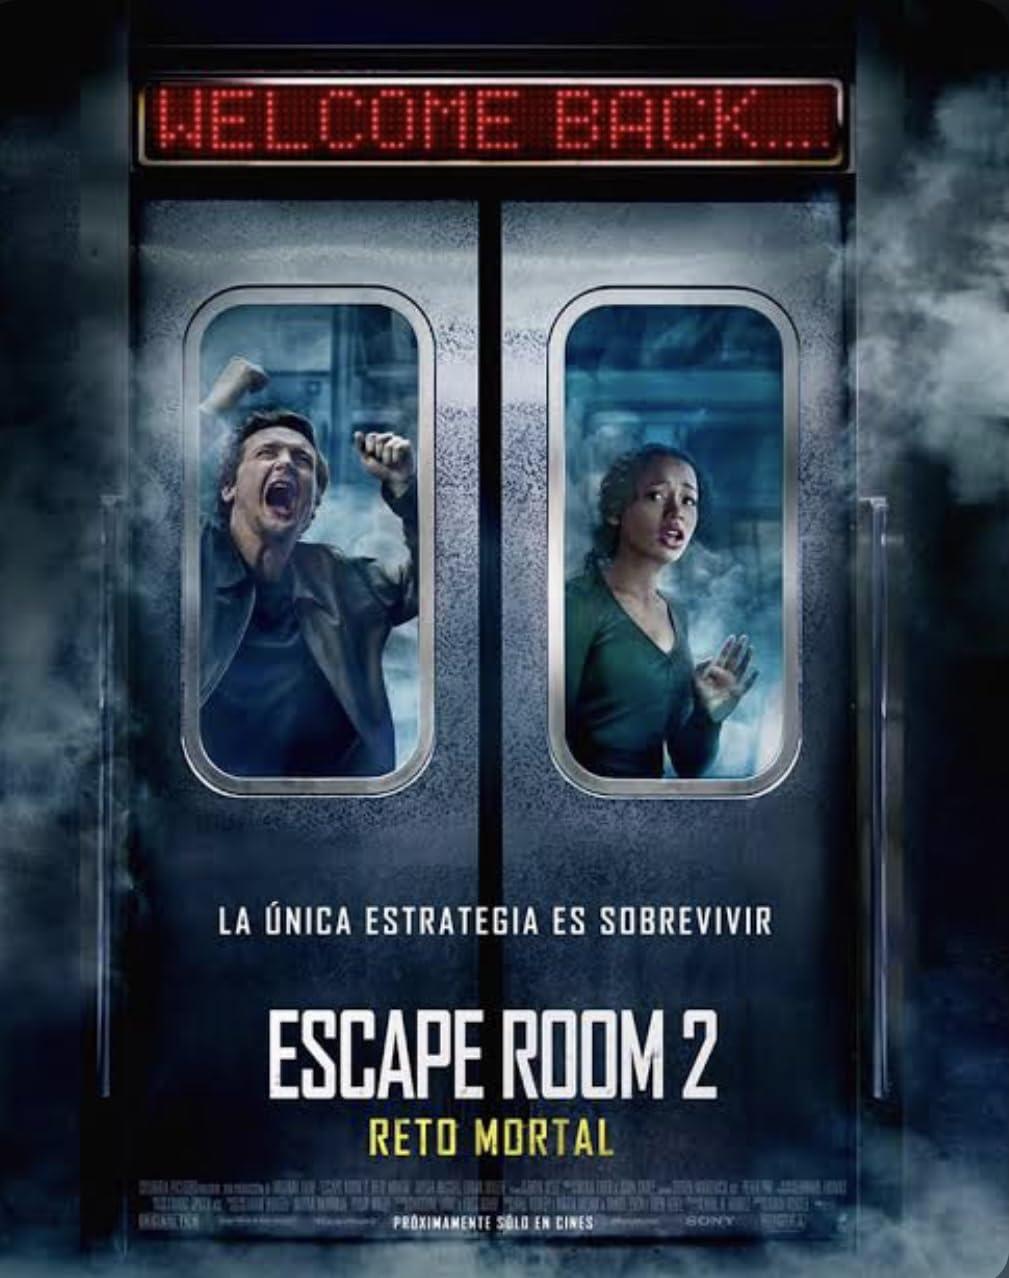 Escape Room: Tournament of Champions (2021) Hindi Dubbed